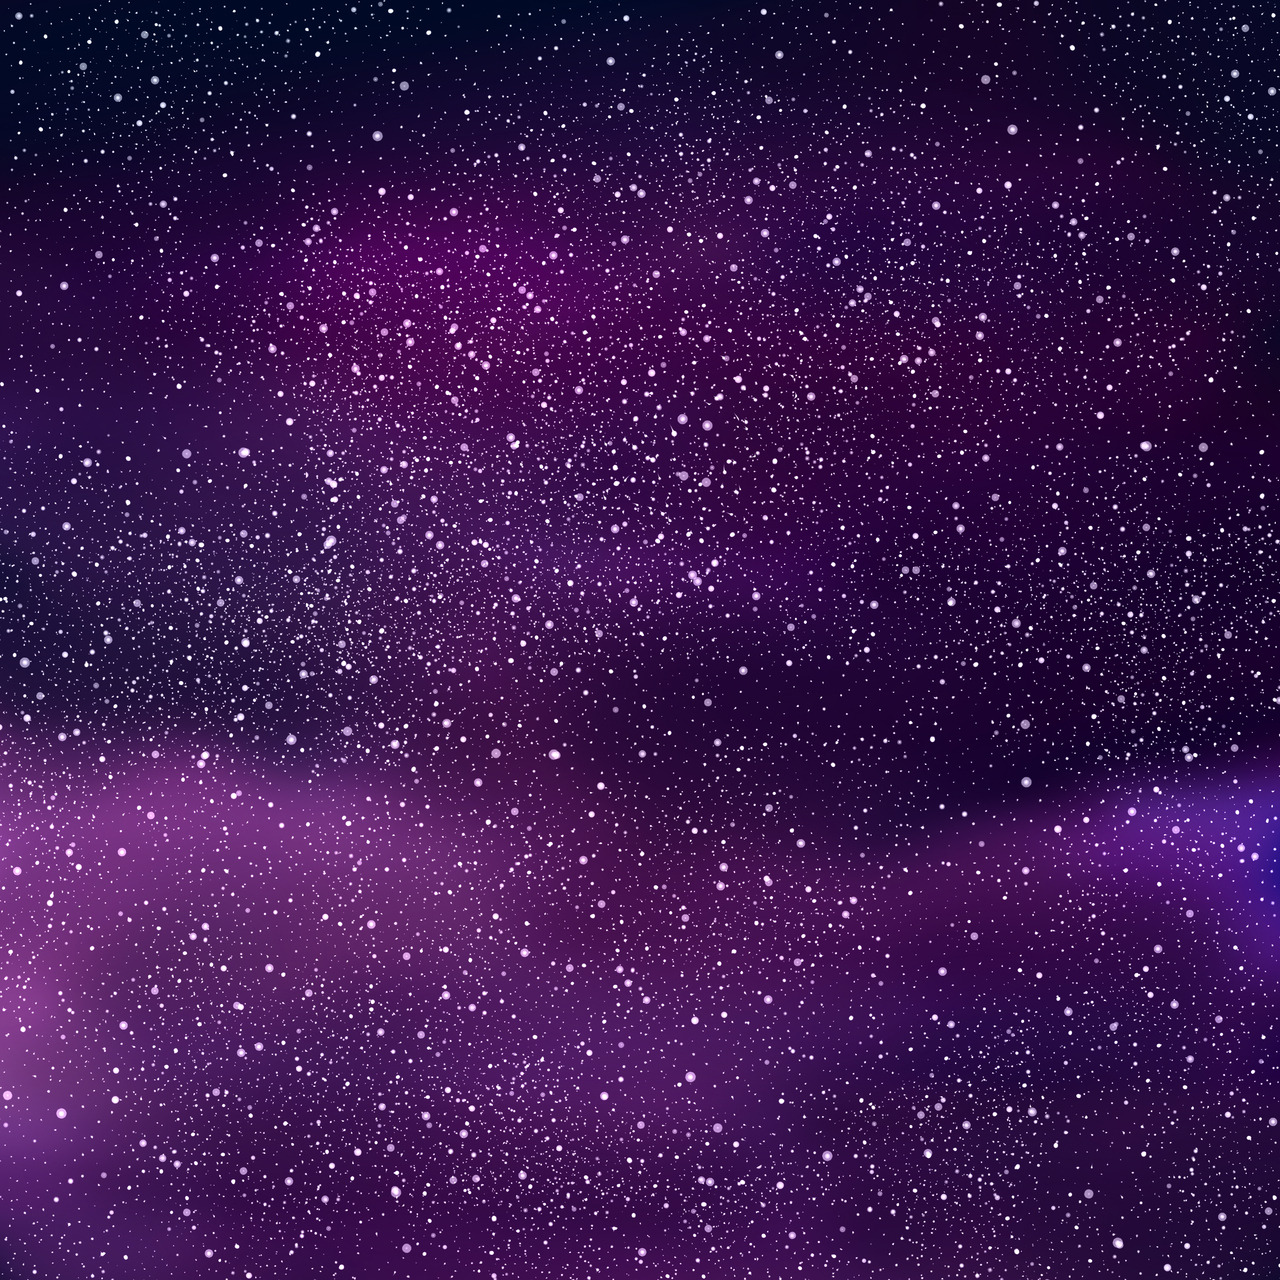 purple galaxy aesthetic - HD1280×1280